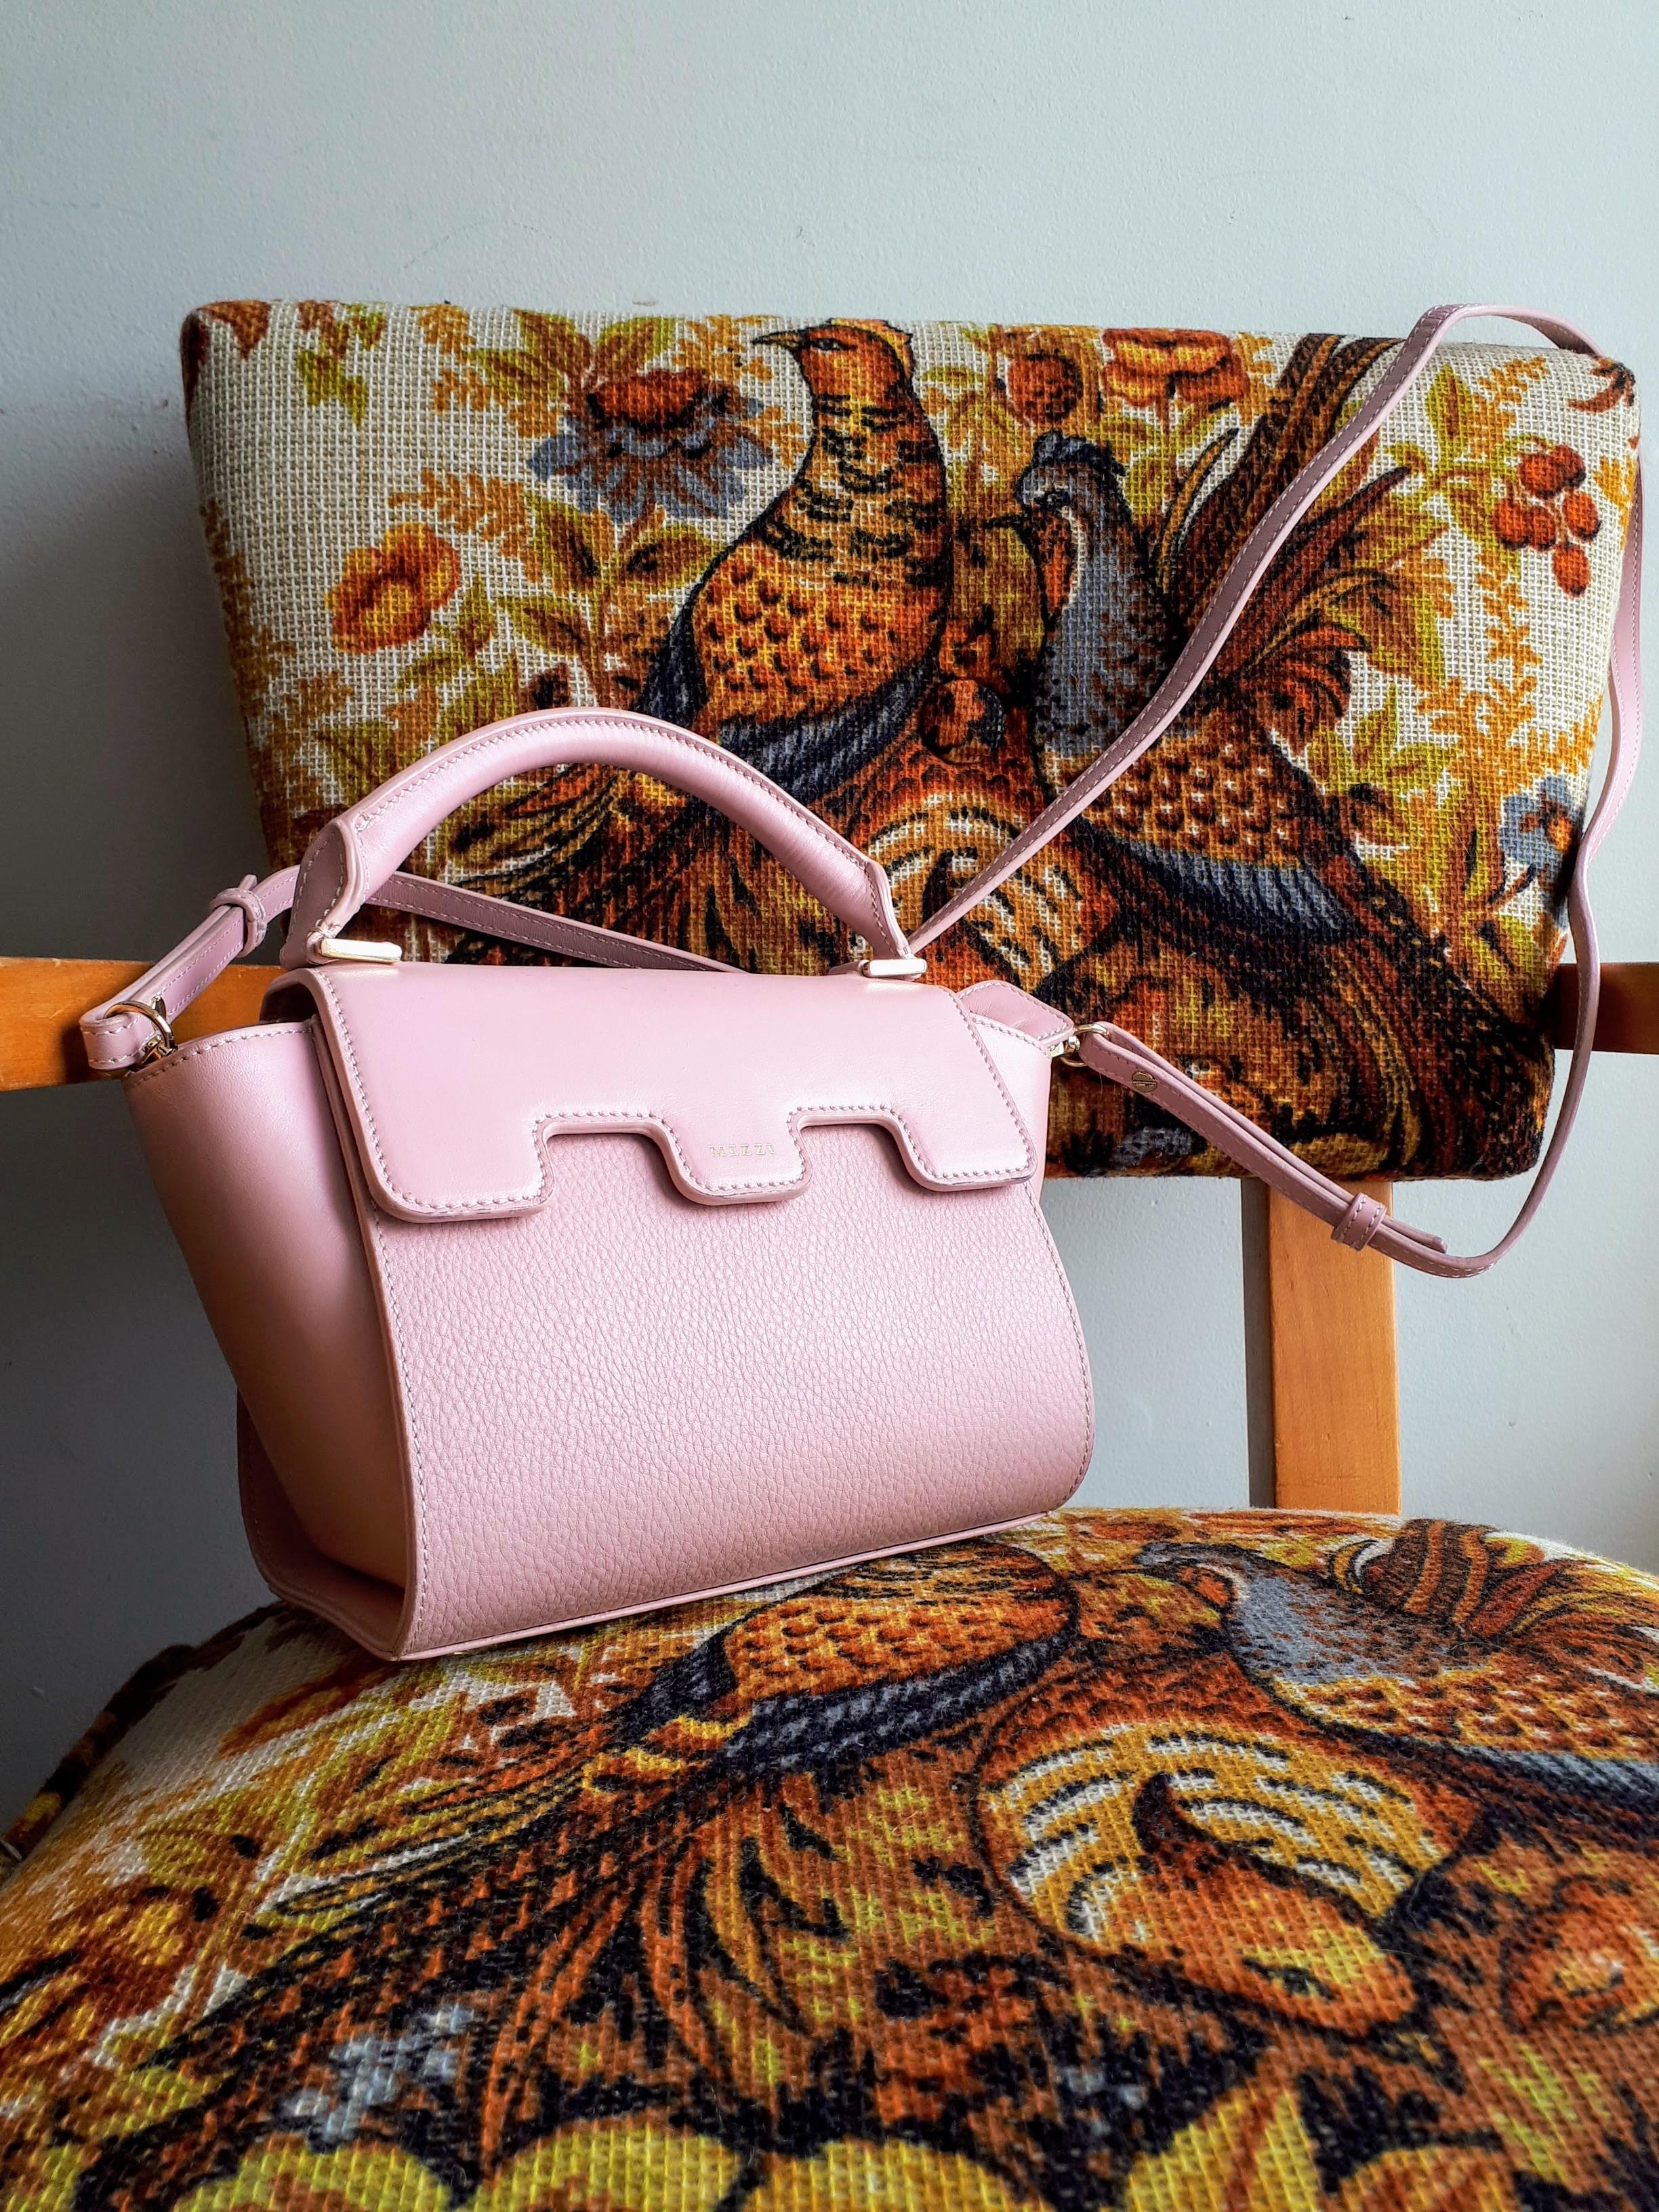 Mezzi bag, $110